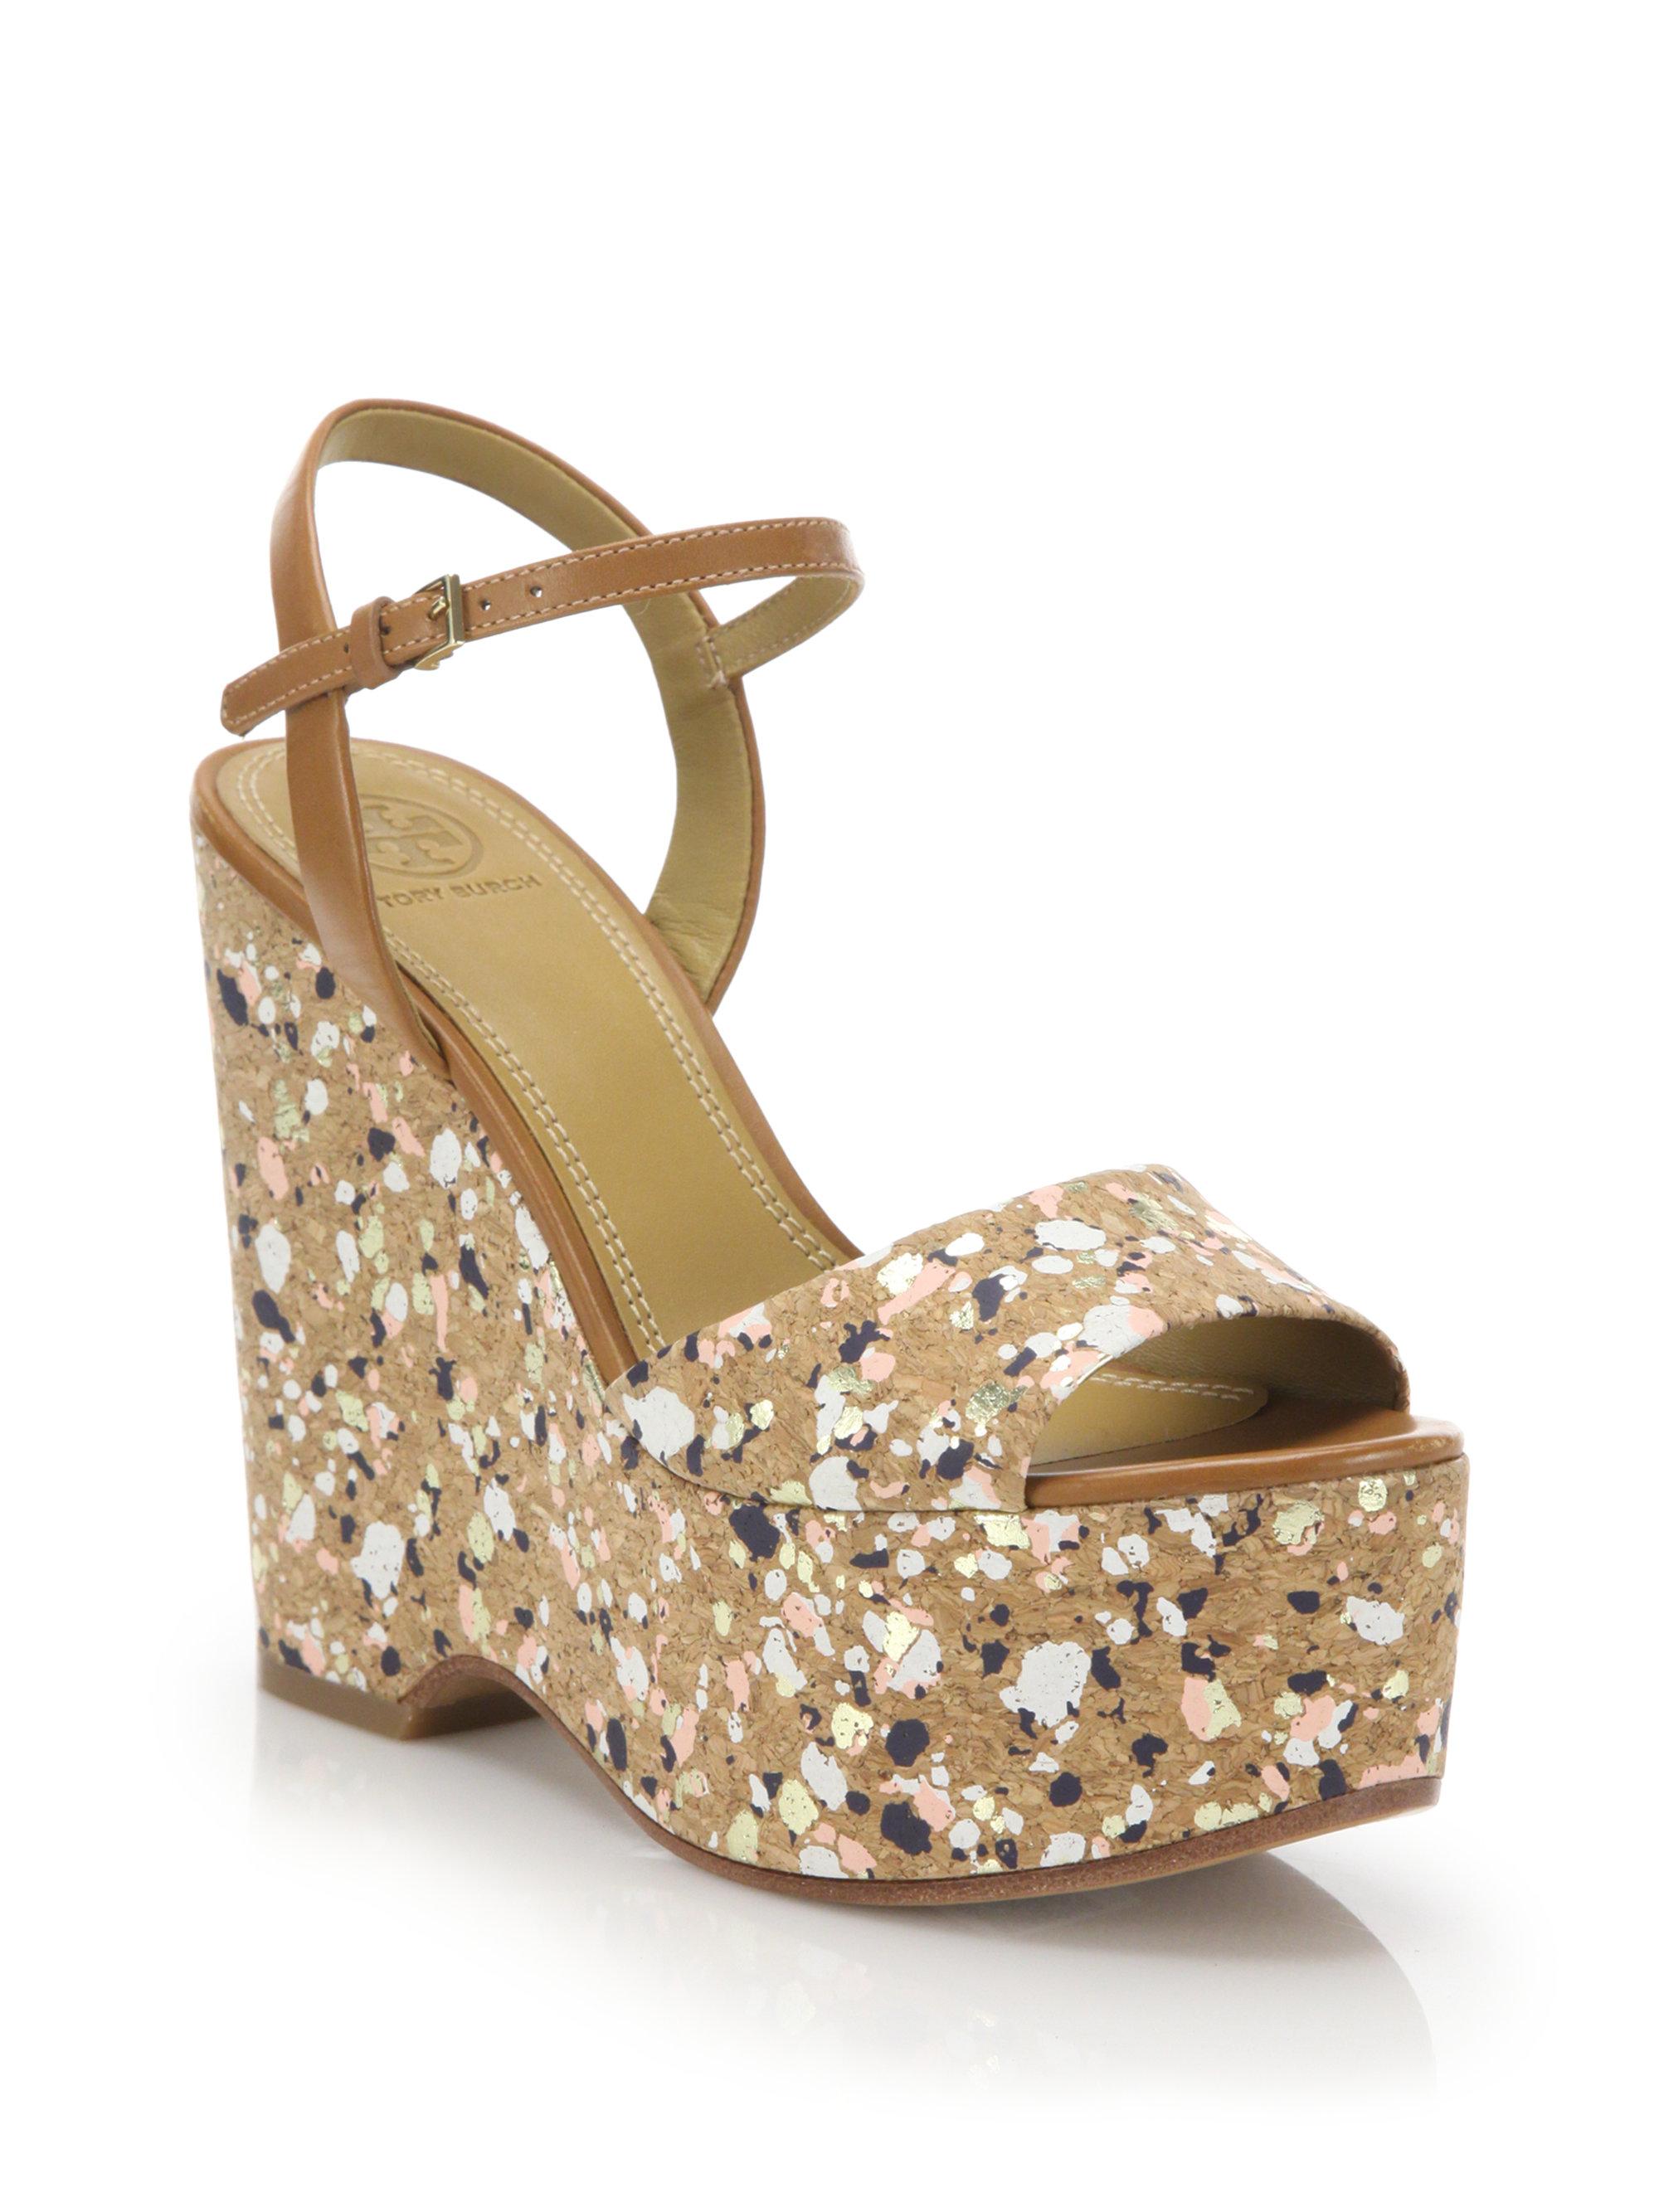 fccdc0c0a Tory Burch Solana Confetti Cork Platform Wedge Sandals in Brown - Lyst